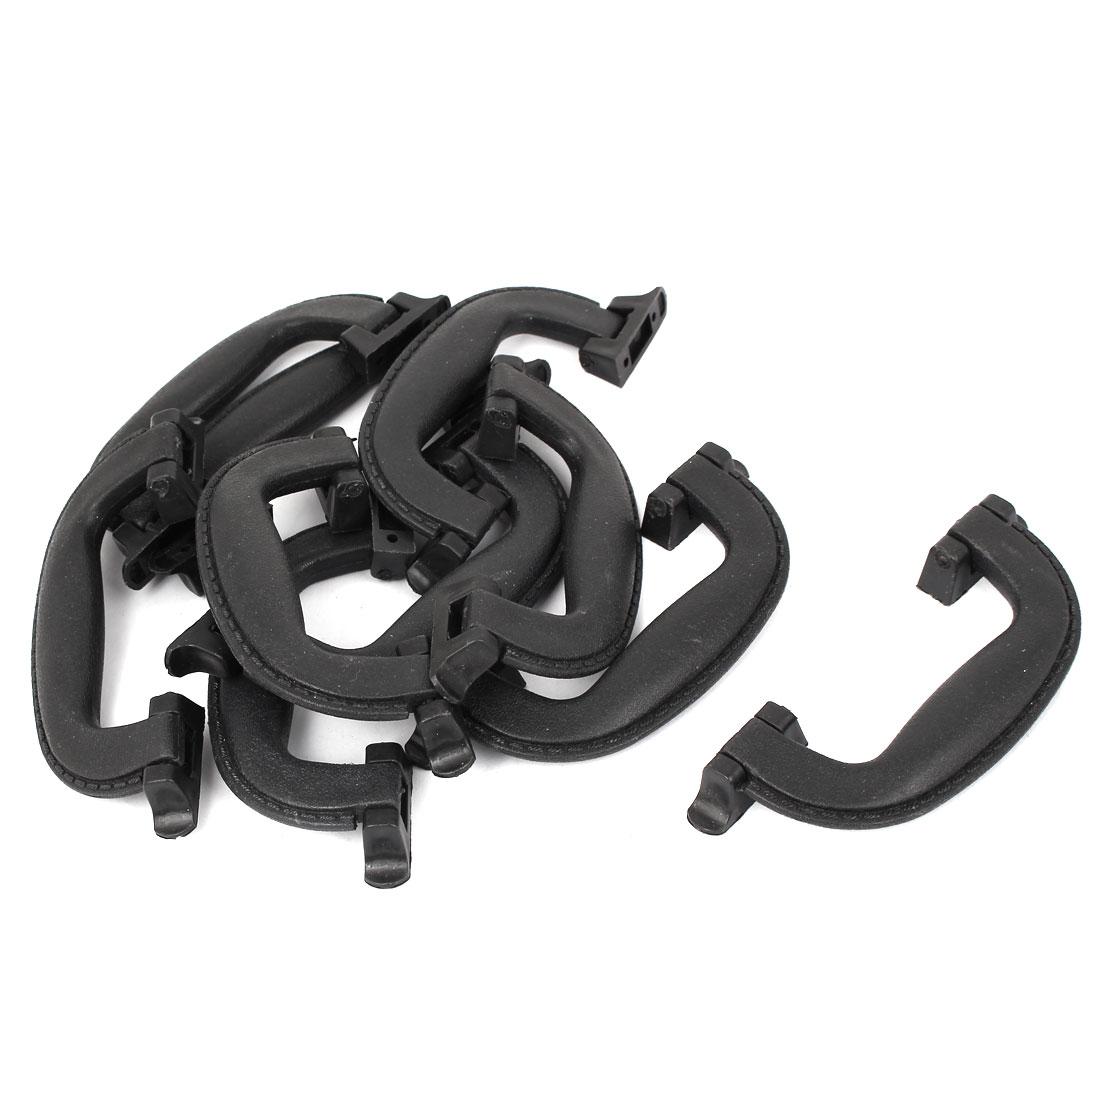 Cabin Drawer Box Plastic Bowing Pull Handle Knob L307E5 Black 10pcs